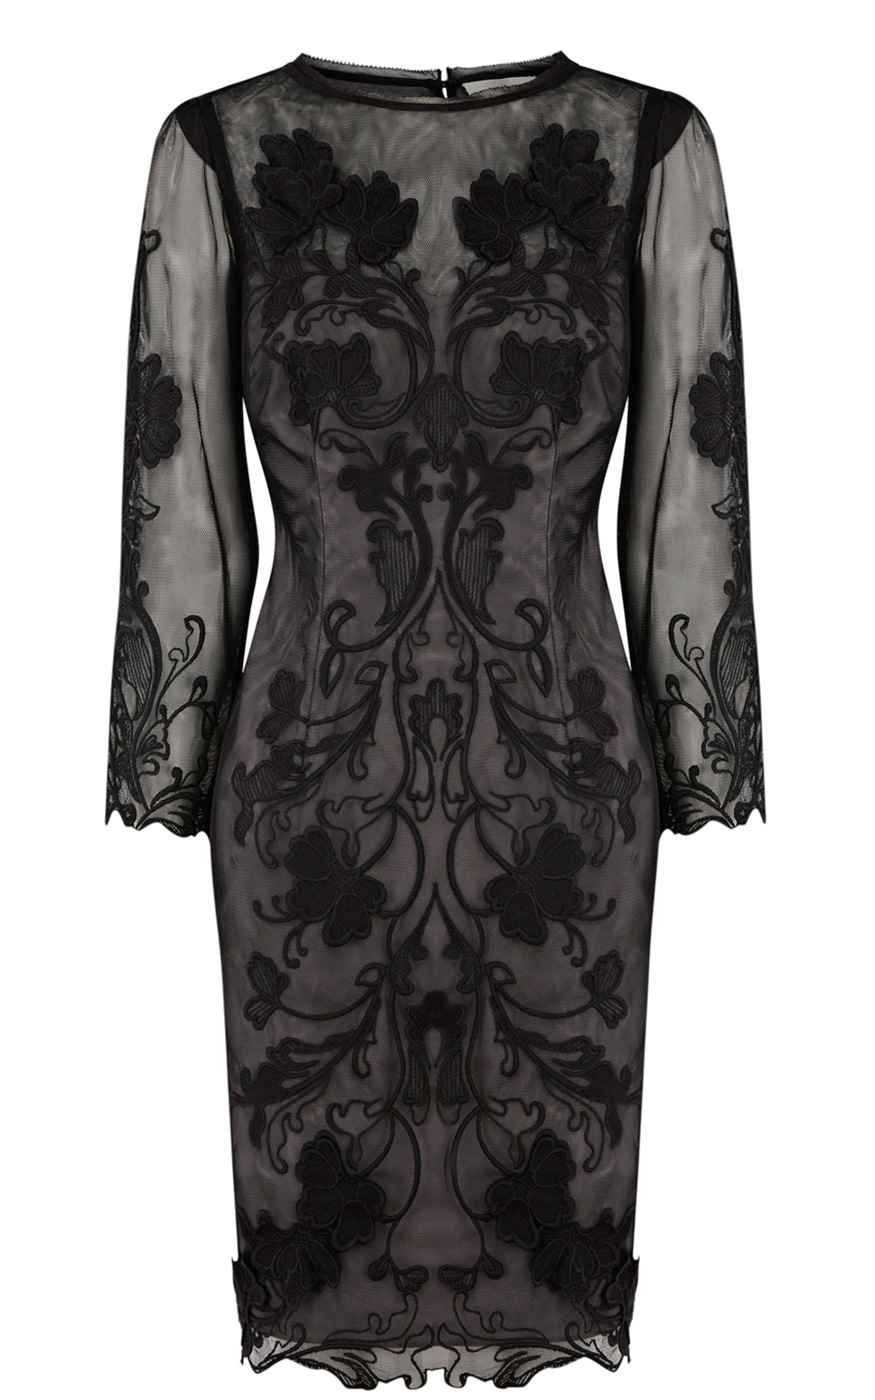 Karen millen d baroque floral lace dress black baroque dresses